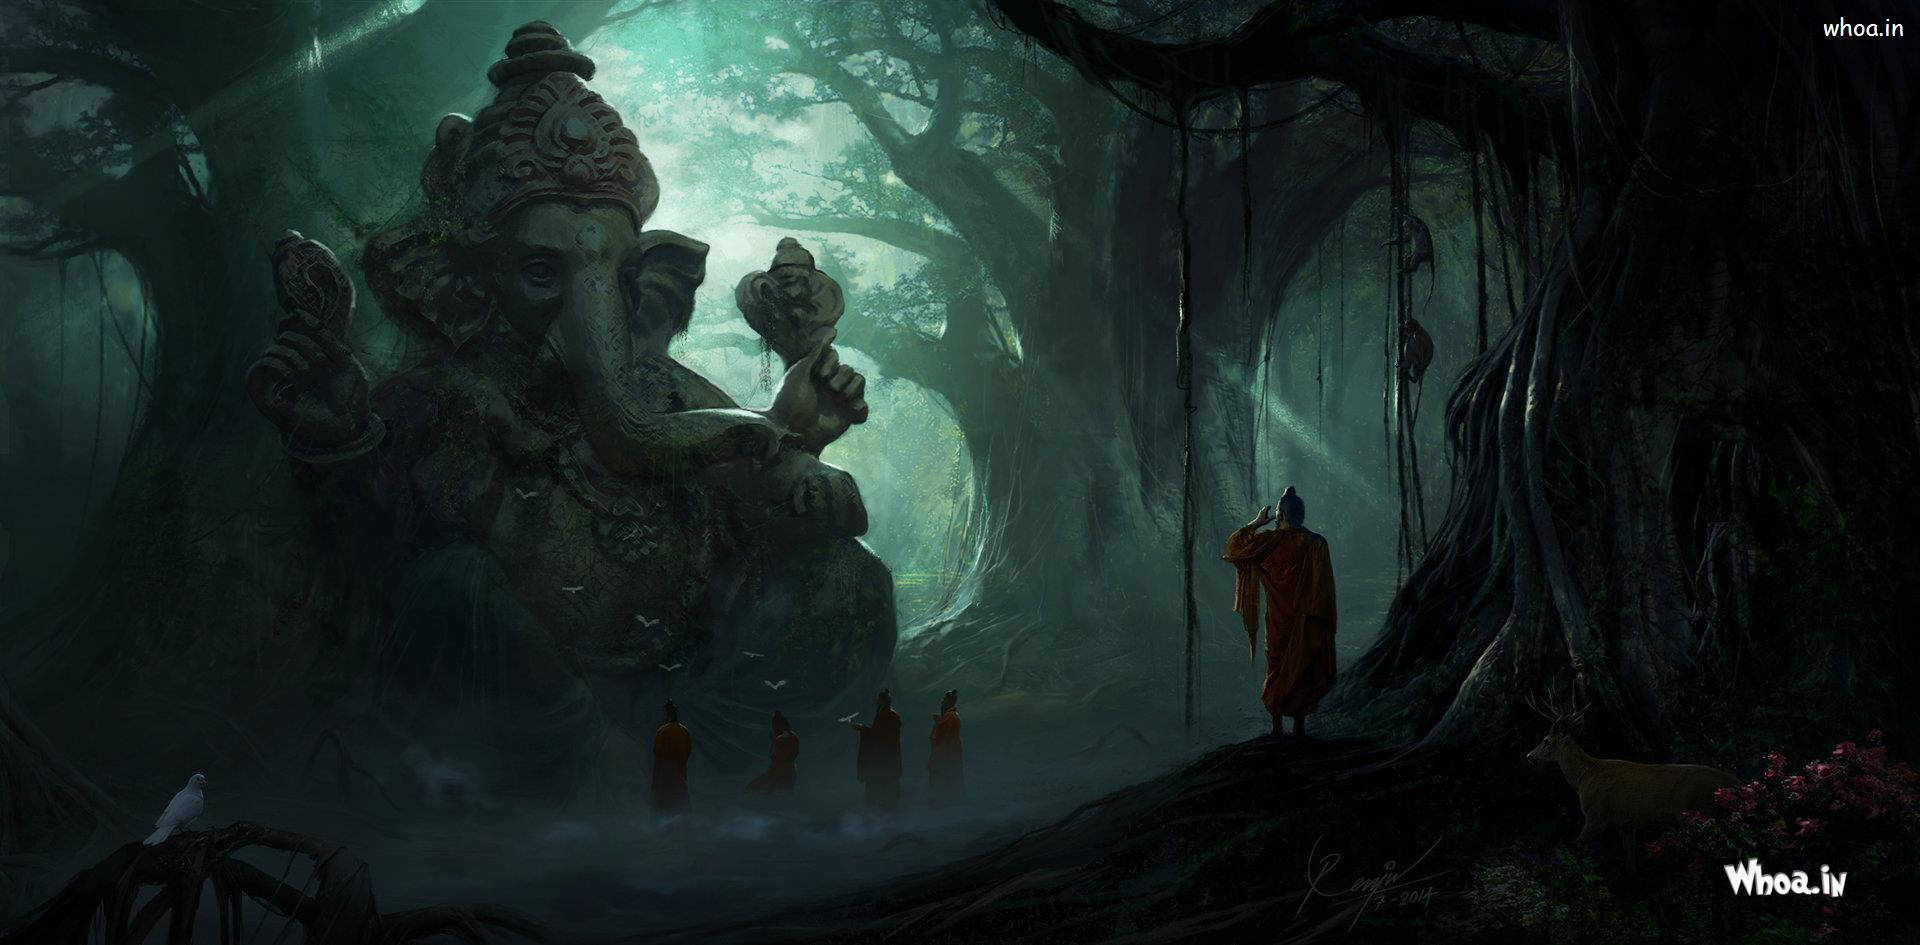 Hd Image Of Lord Ganesha Under The Big Tree